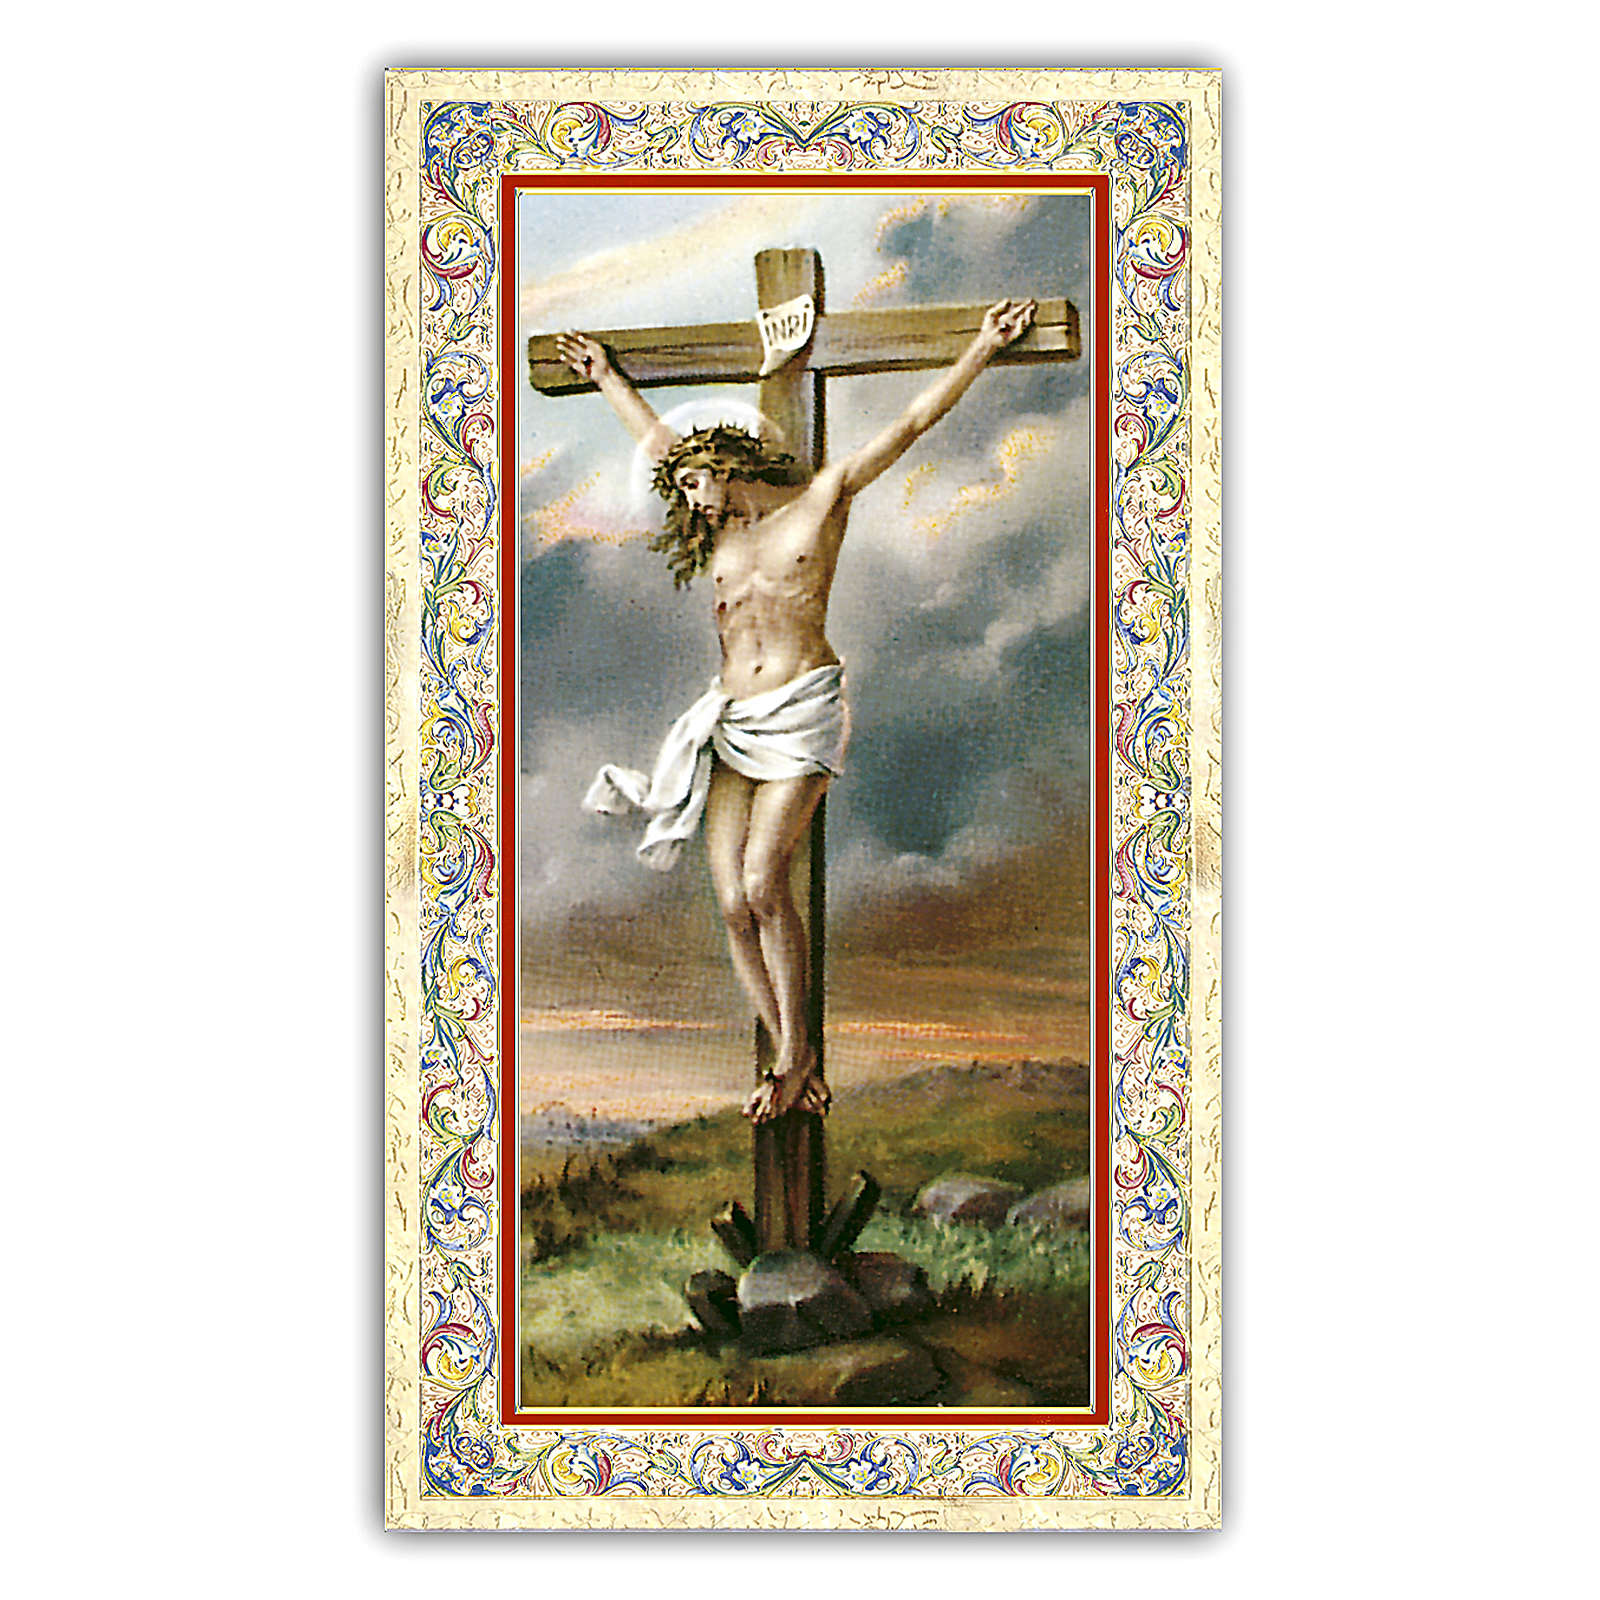 Santino Gesù Crocefisso 10x5 cm ITA 4